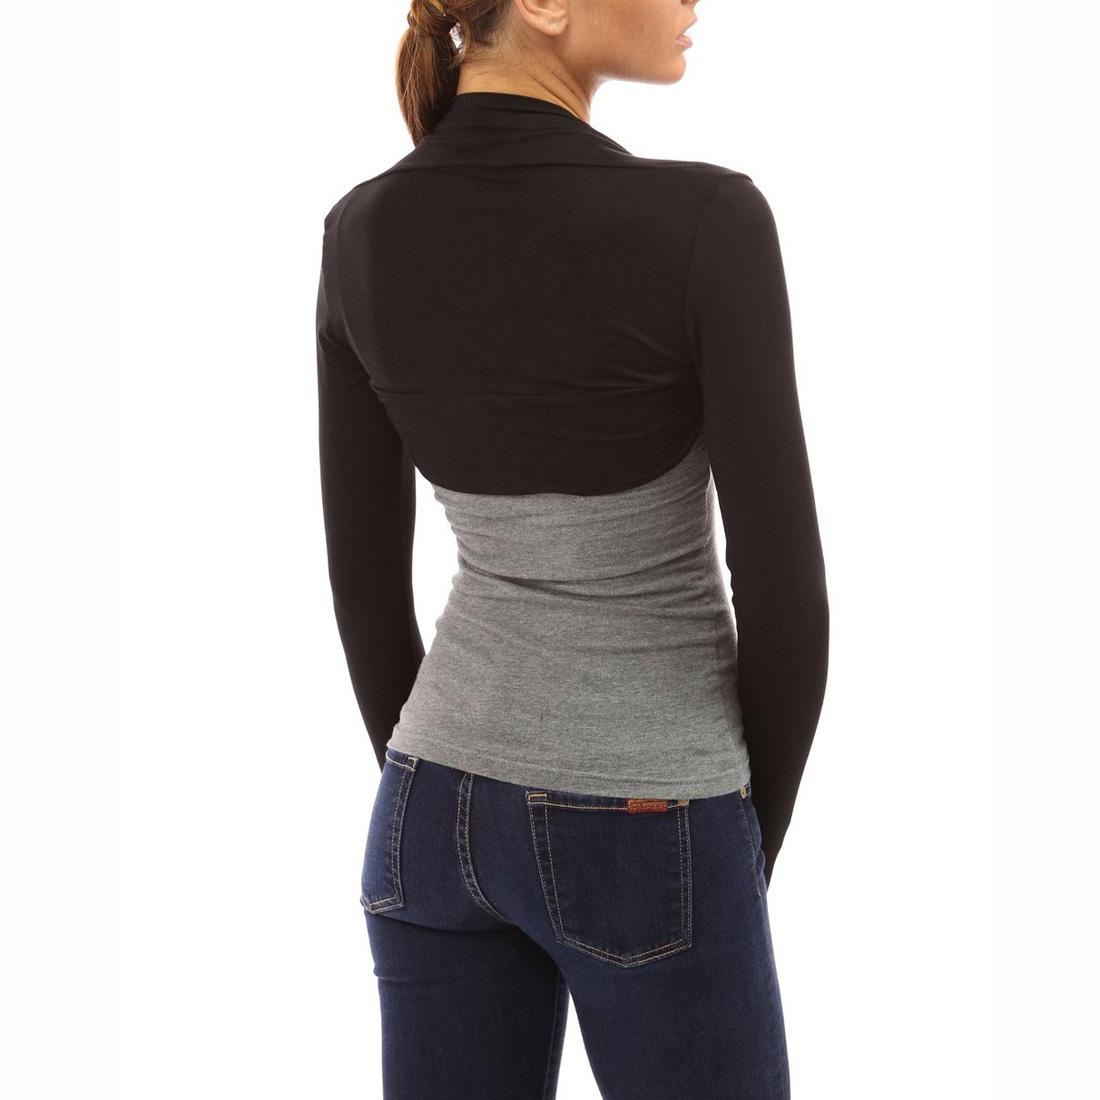 0232a3993f Womens Long Sleeved Bolero Shrug Ladies Plain Cropped Cardigan ...